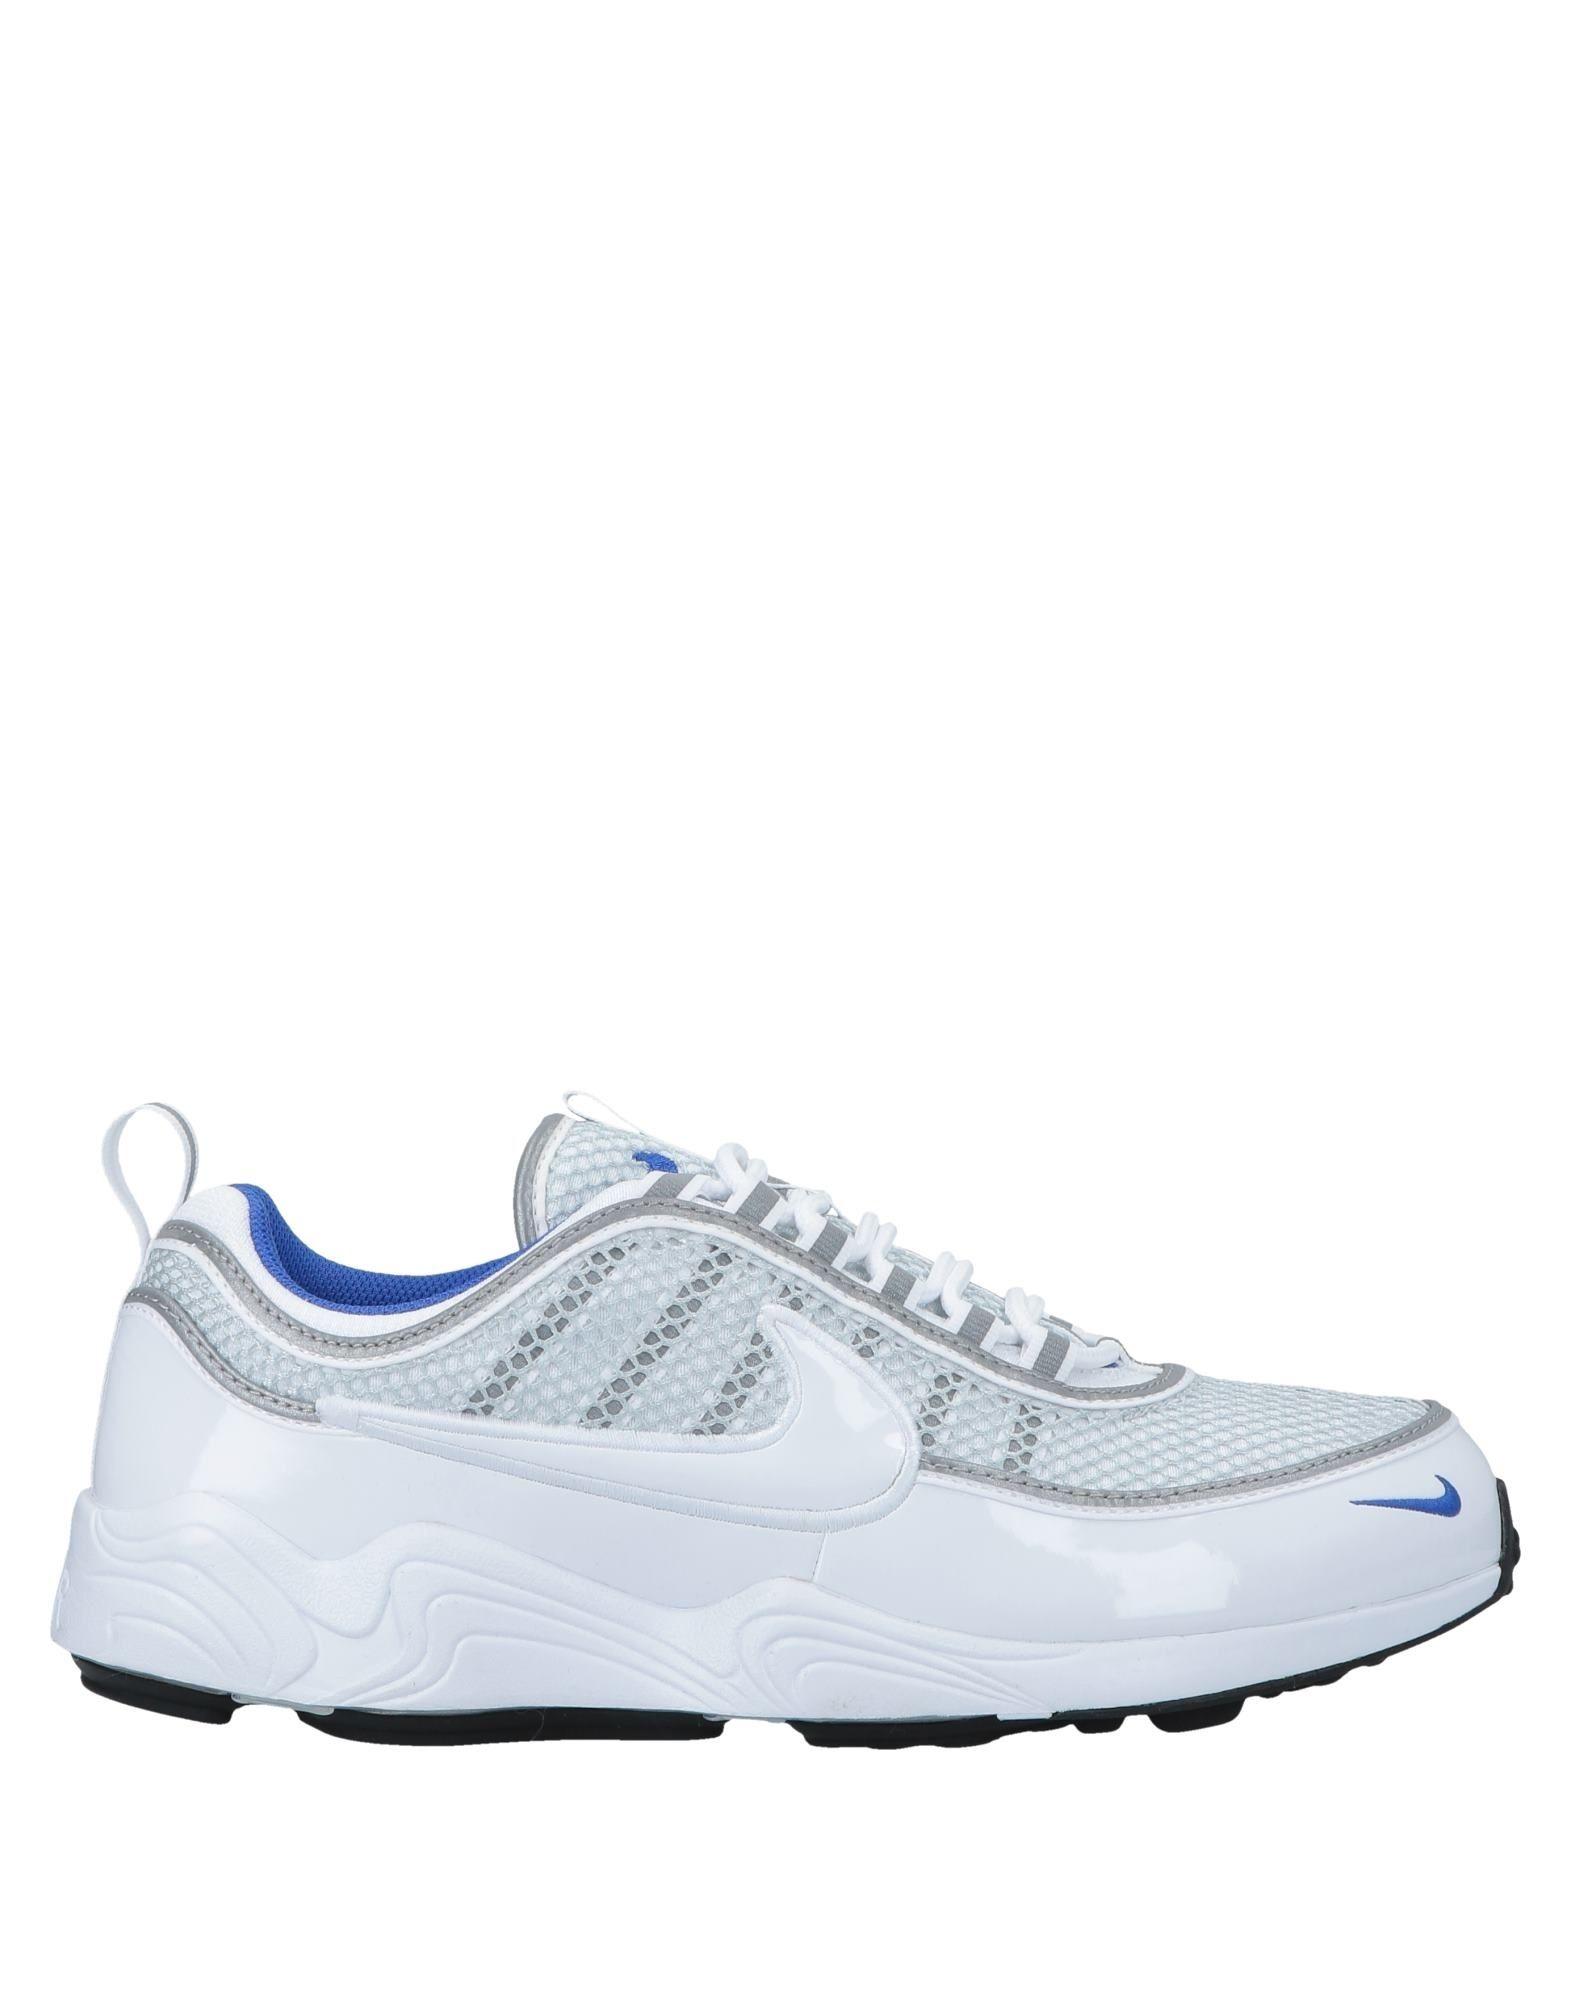 NIKE Низкие кеды и кроссовки кеды кроссовки низкие nike zoom stefan janoski cnvs black white